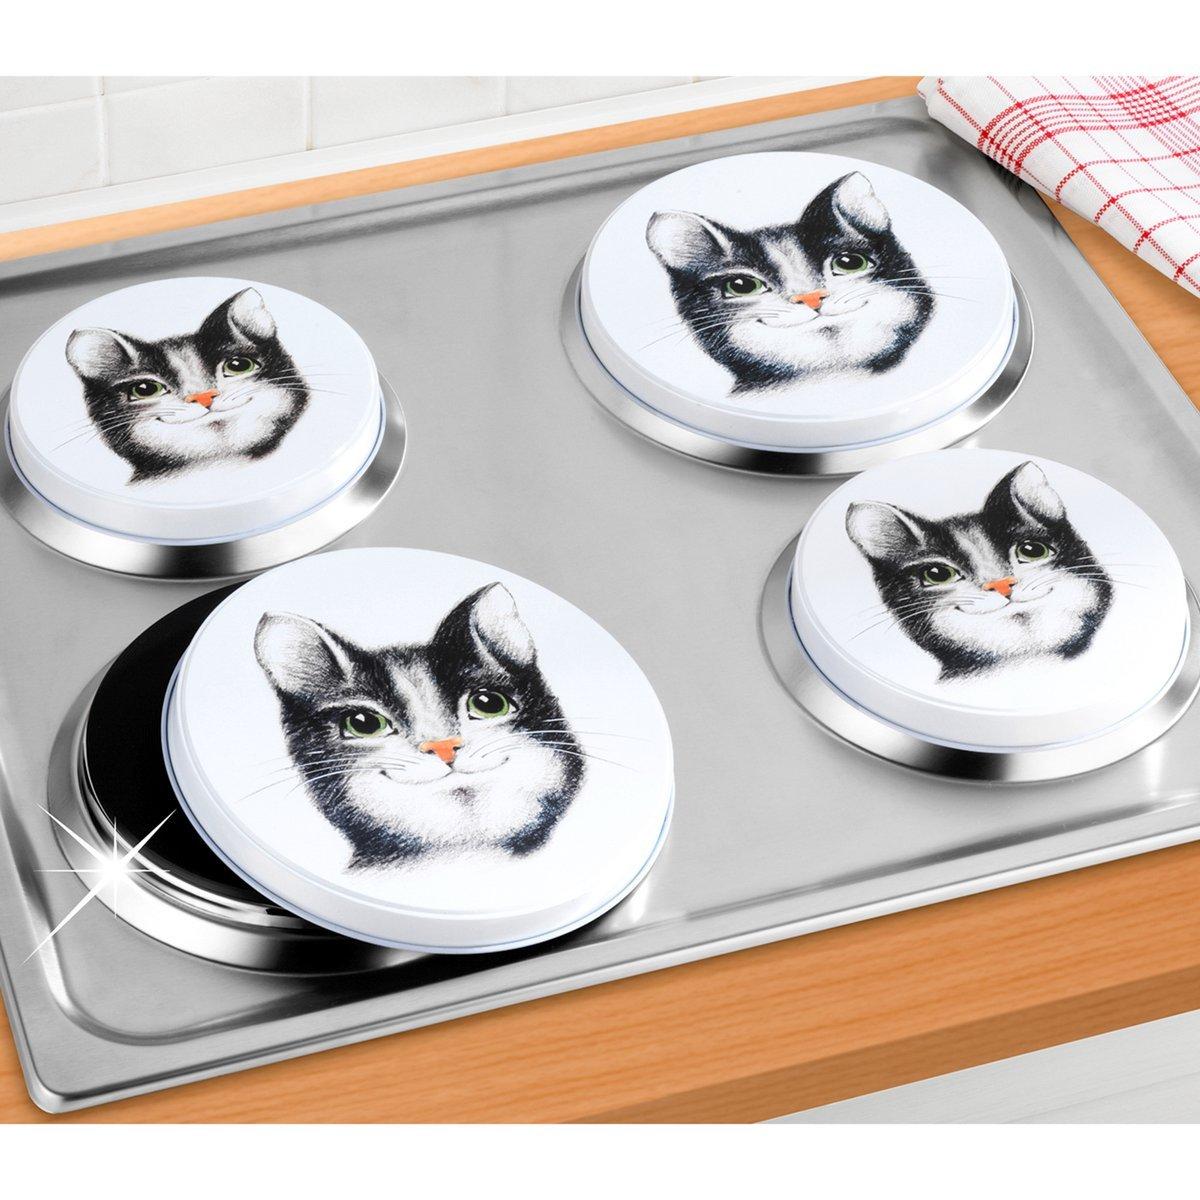 Wenko hob covers, Felix cat design, set of 4, betal, multicoloured, 20 cmx 20 cmx 1.8cm, 2236120900